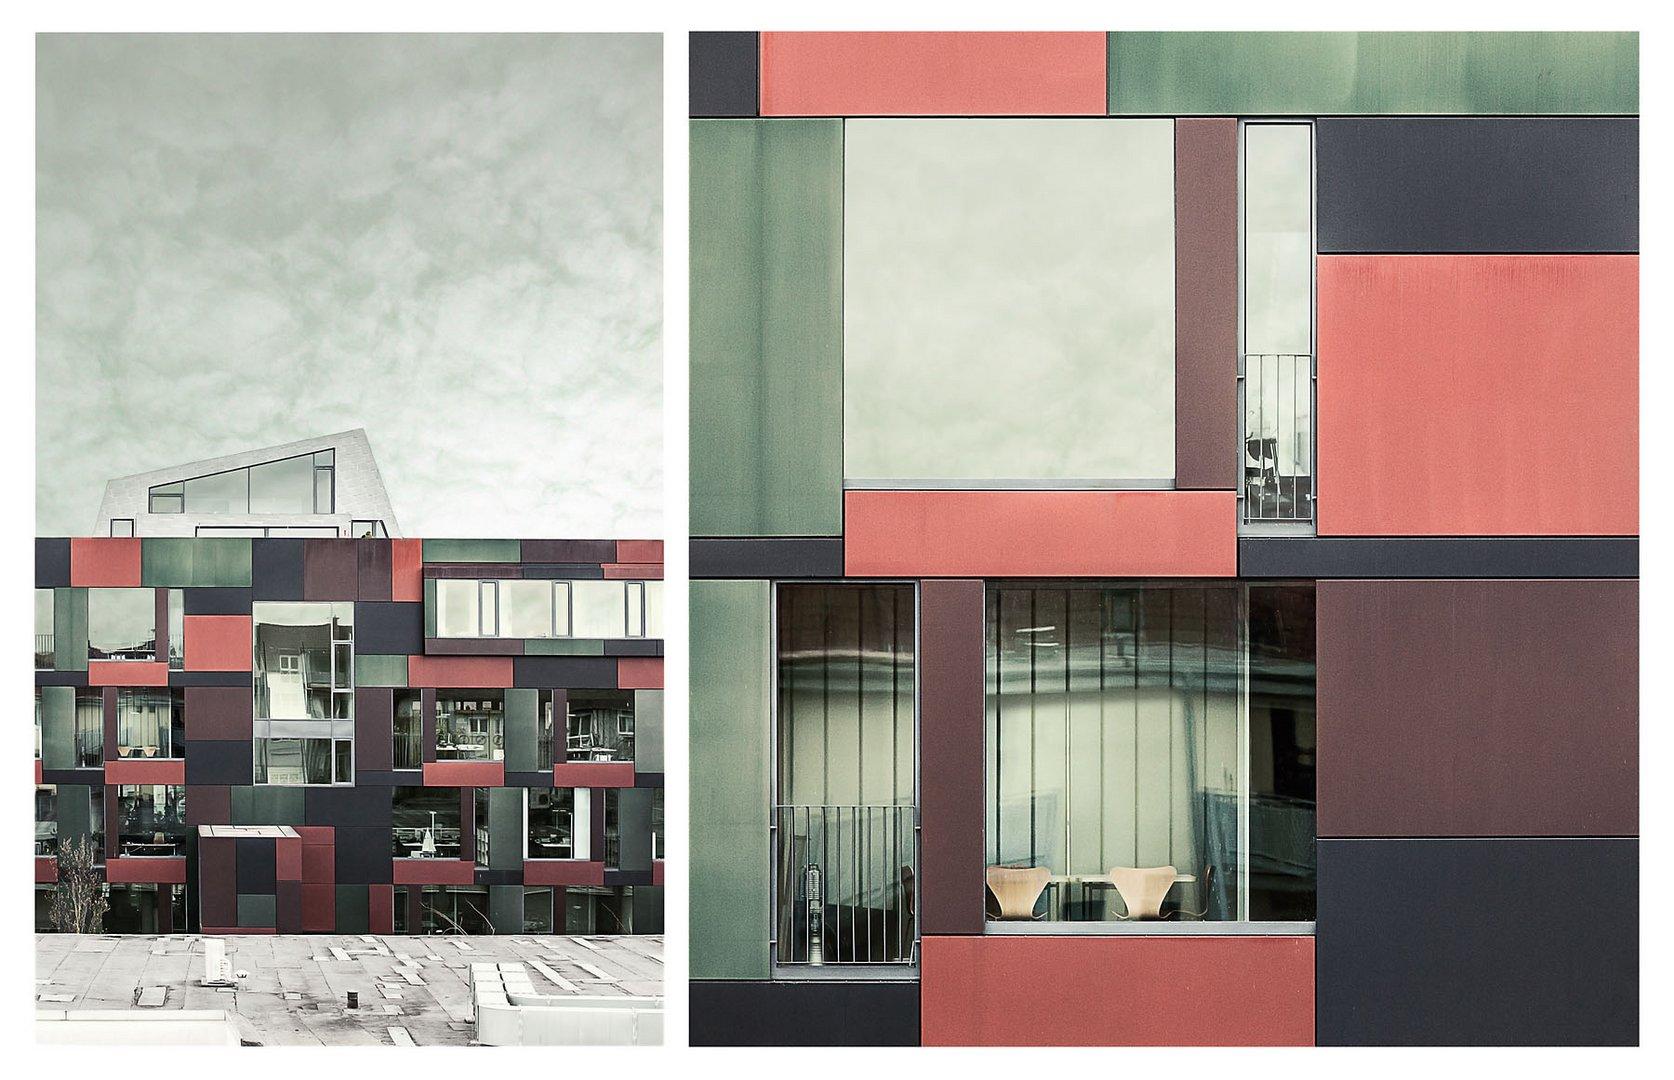 Quarchitektur